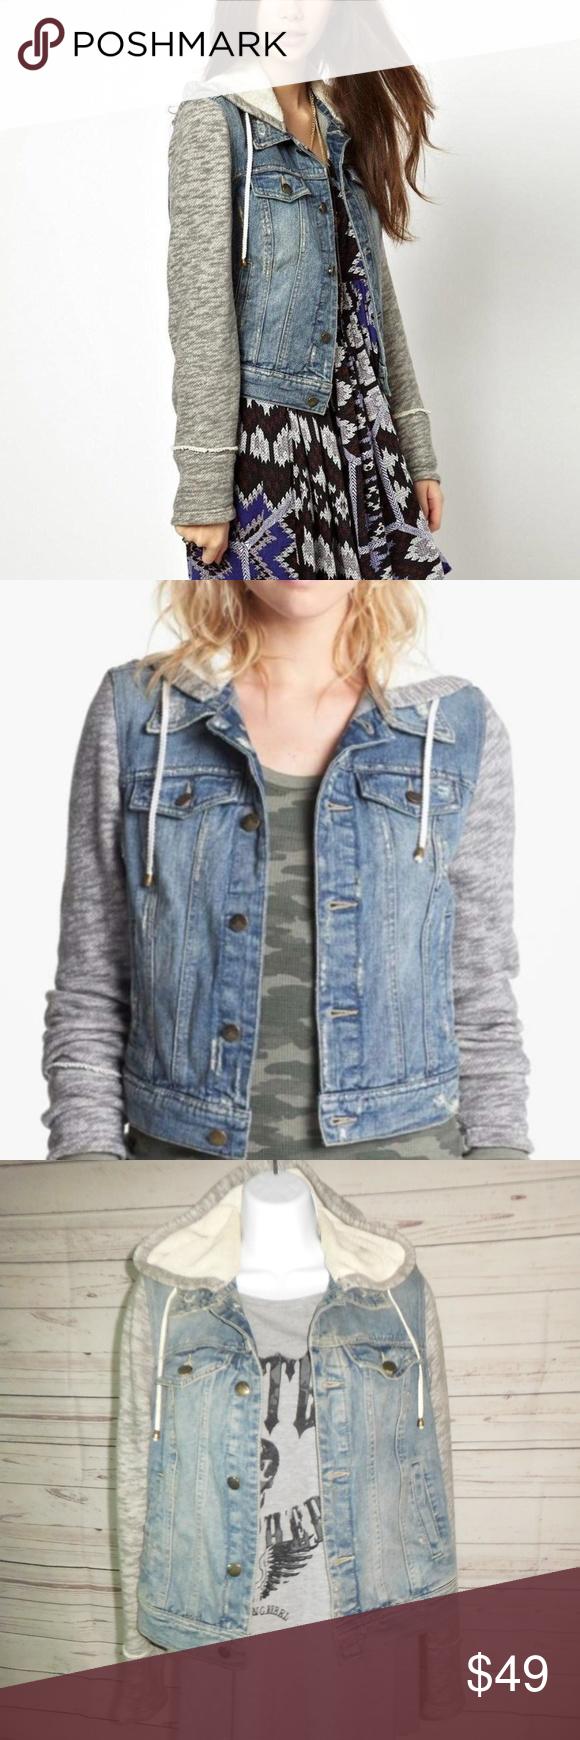 Free People Distressed Denim Hooded Jean Jacket Sp Distressed Denim Hooded Jean Jackets Clothes Design [ 1740 x 580 Pixel ]